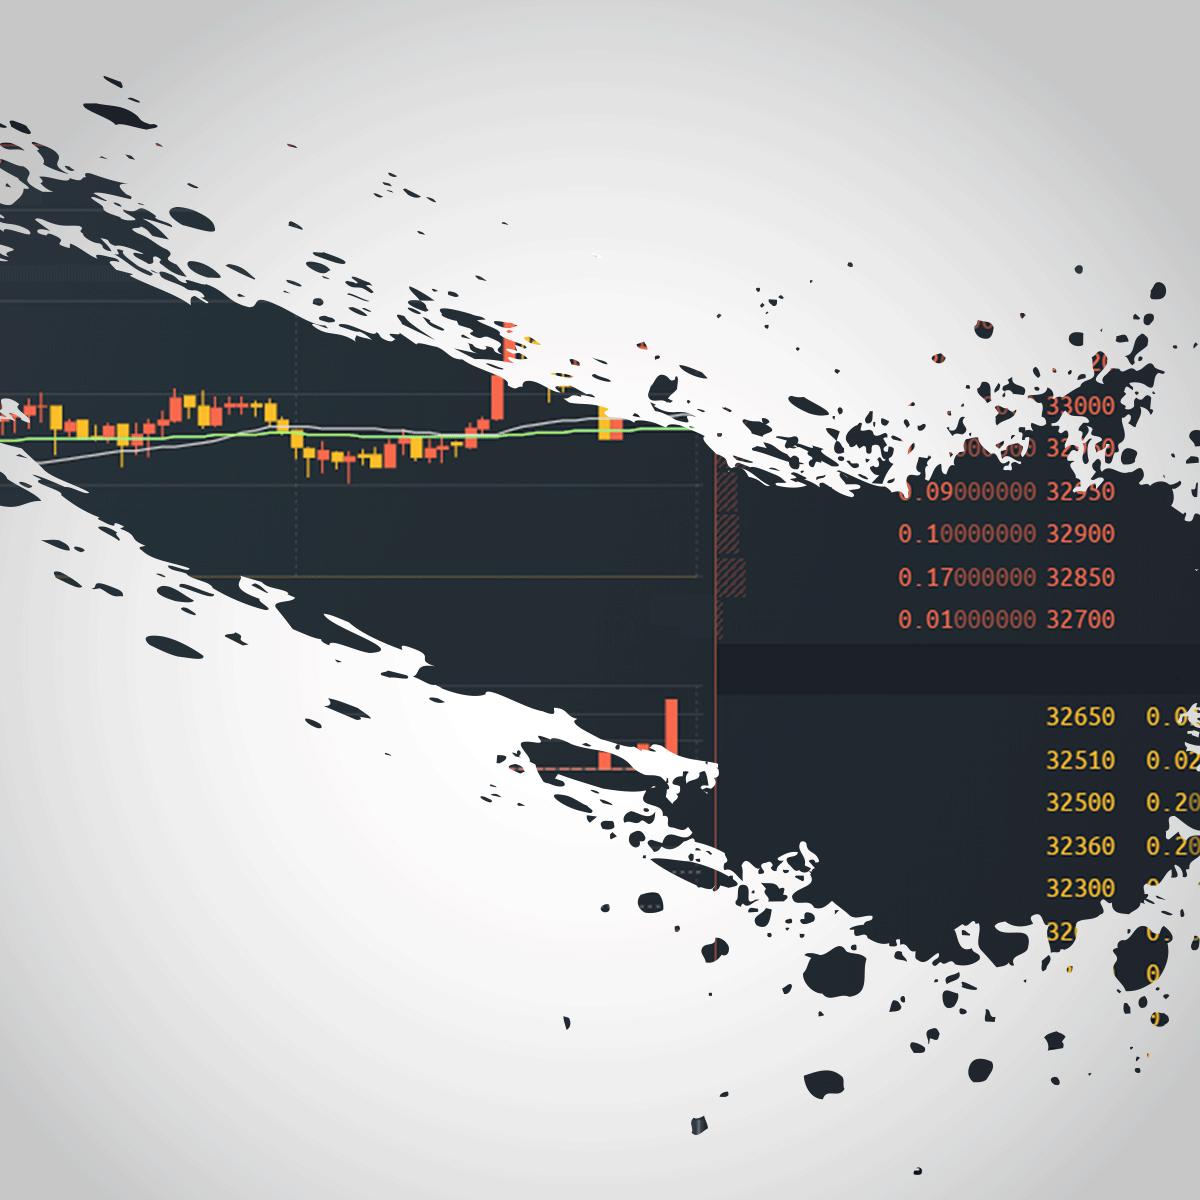 test ツイッターメディア - bitFlyerの仲値 = ¥1,101,628 1BTC販売価格 = ¥1,074,337 1BTC買取価格 = ¥1,128,918 (2019年09月17日 10時23分55秒) #ビットフライヤー https://t.co/D3HMZ8uTtF